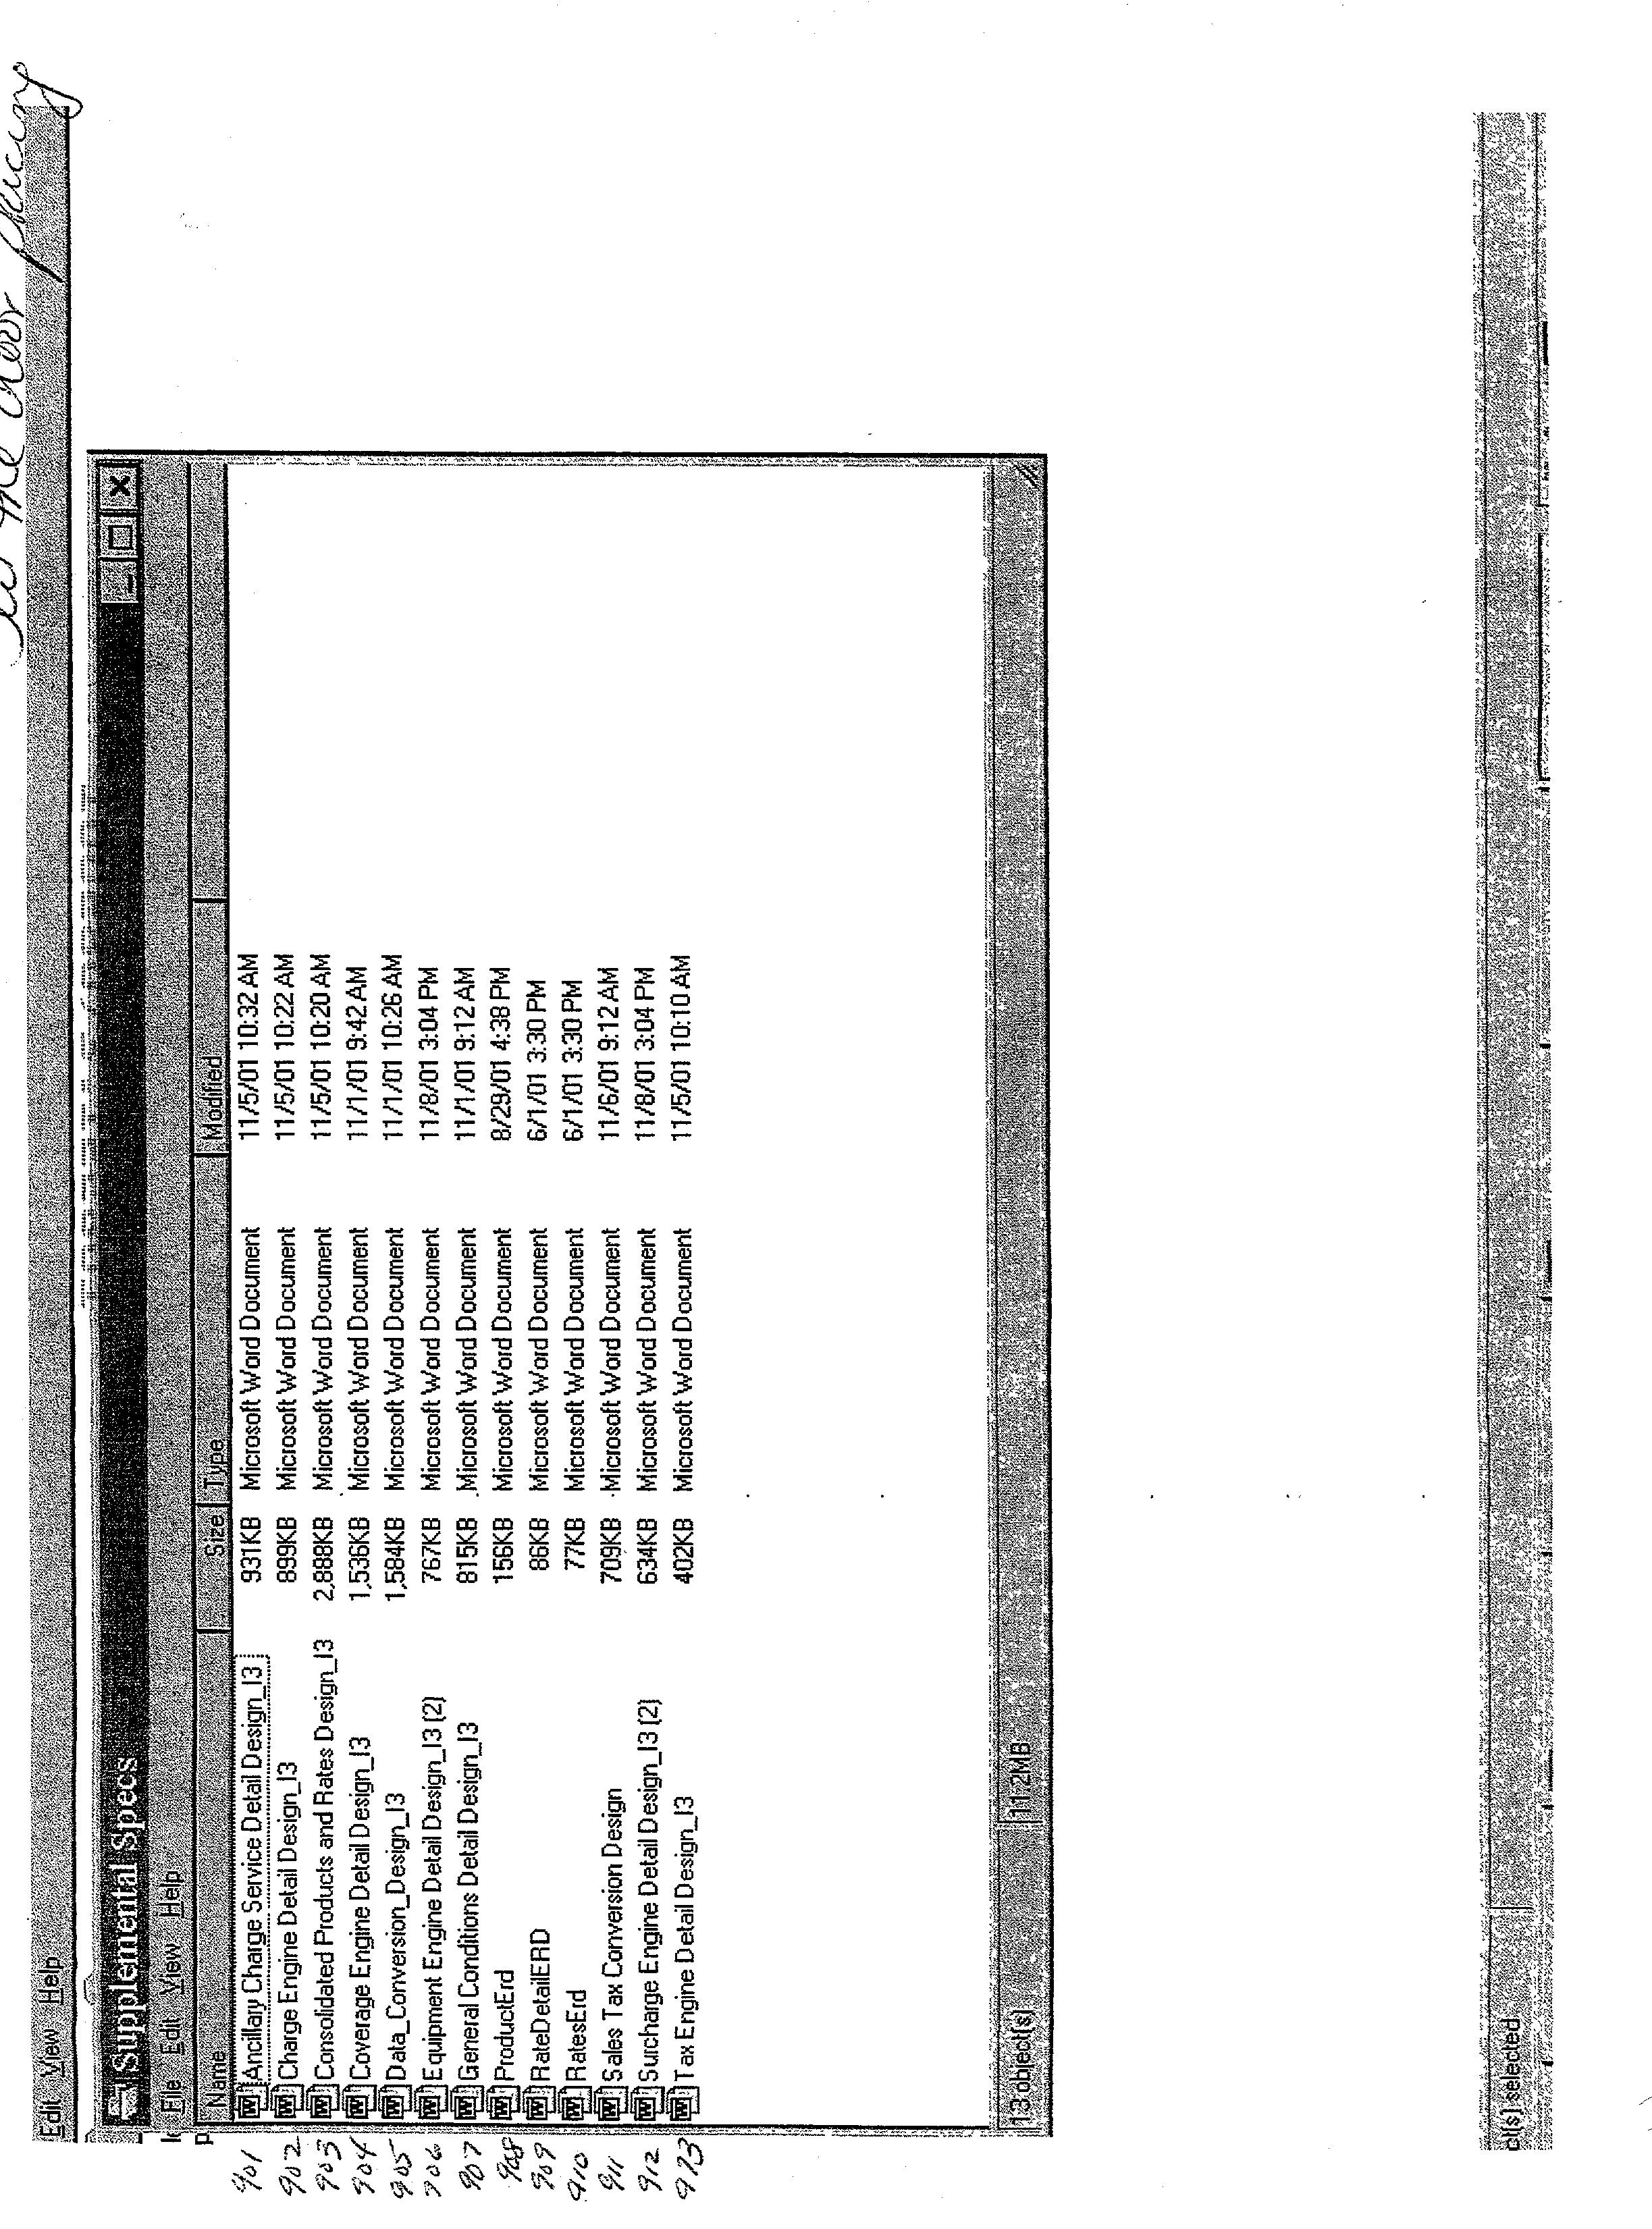 Figure US20030125992A1-20030703-P00813